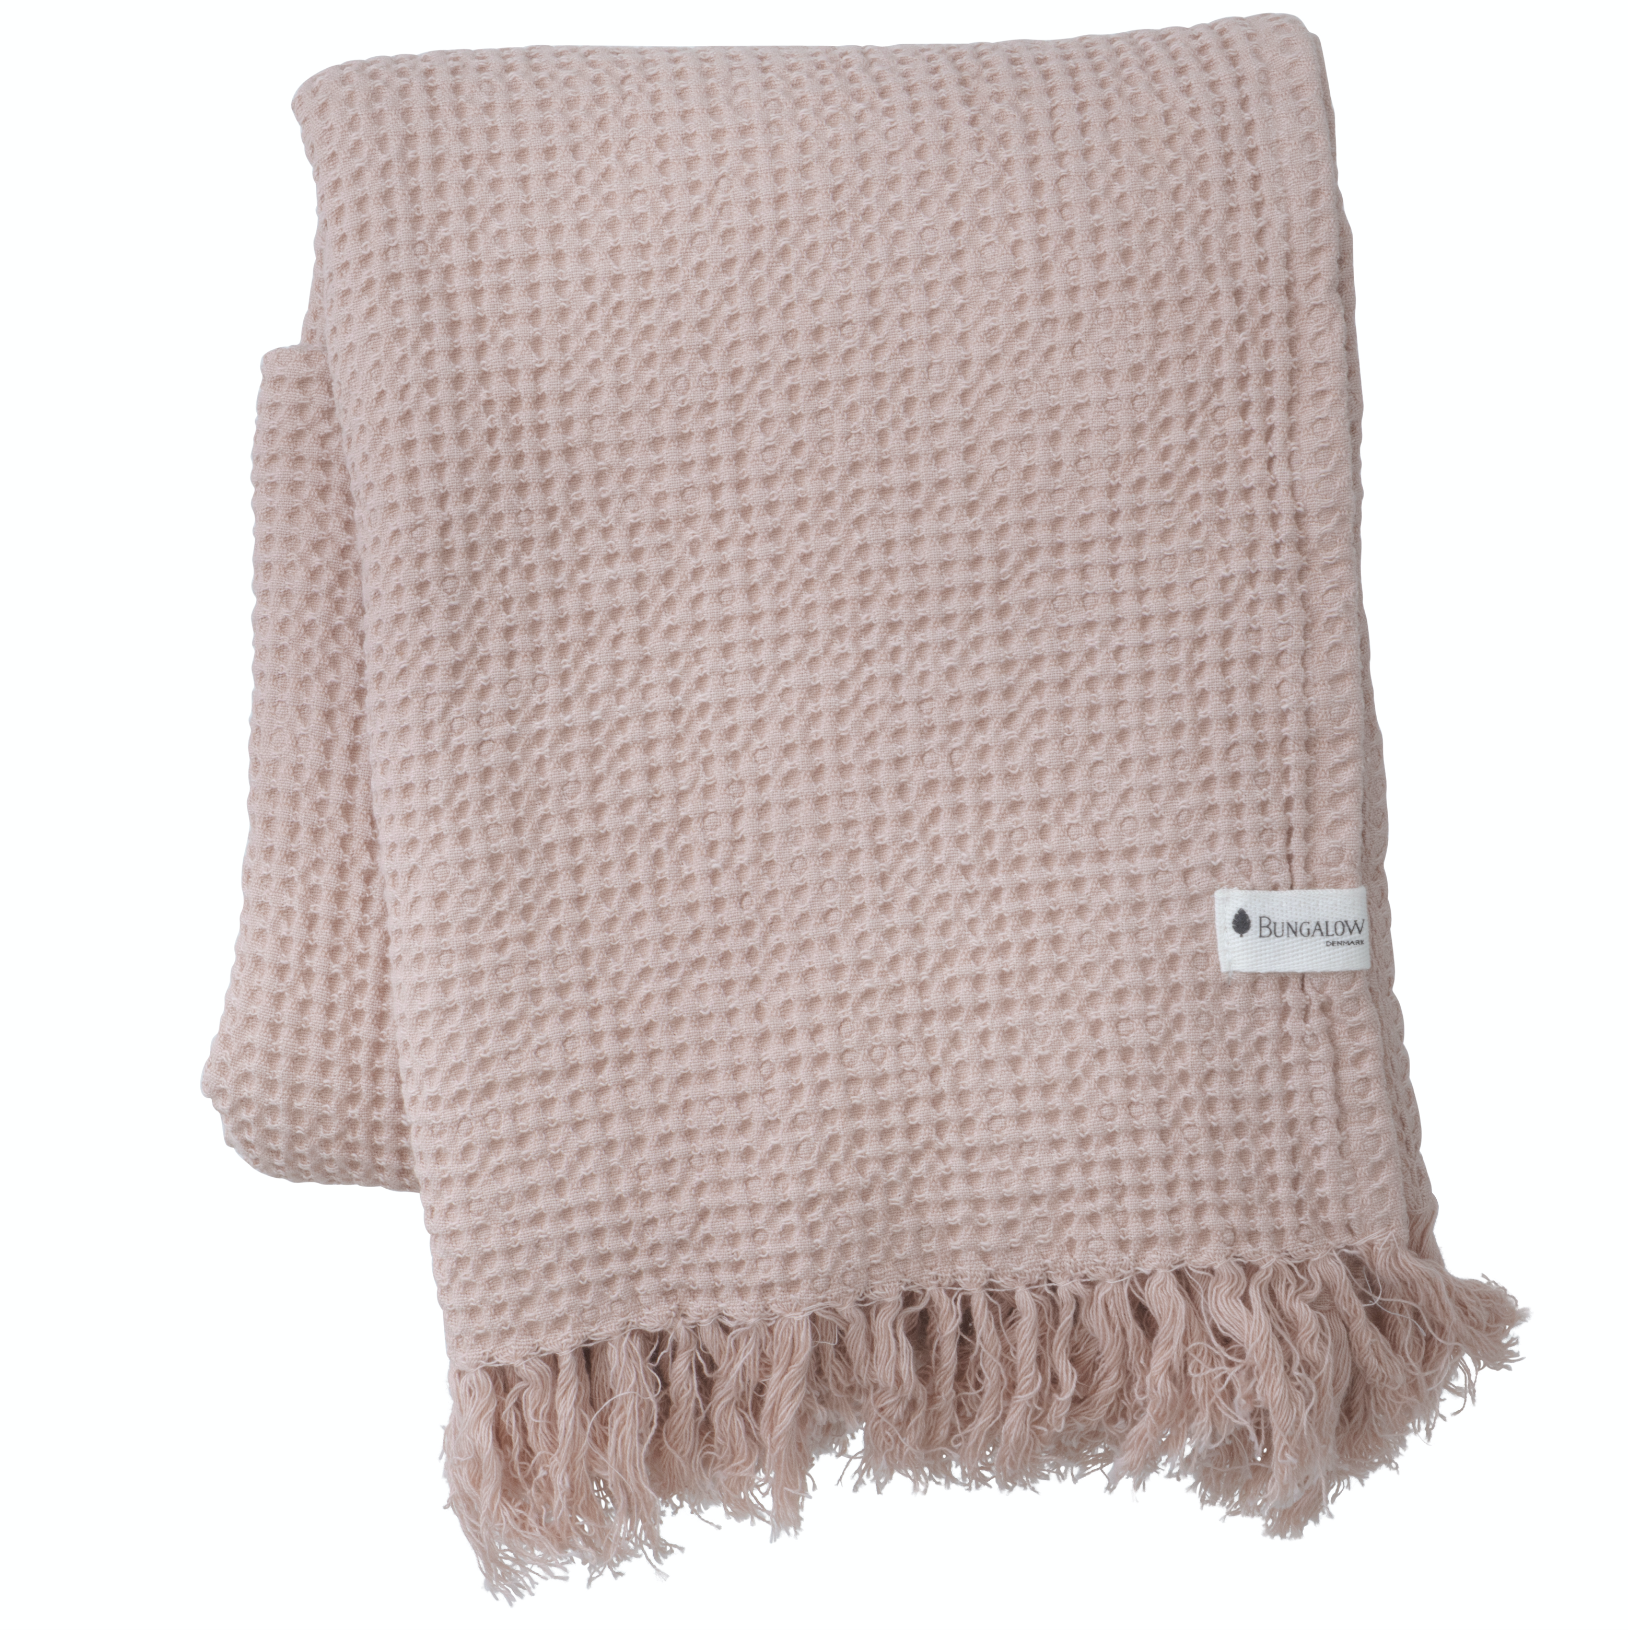 Waffly towel 120x70cm, Pink